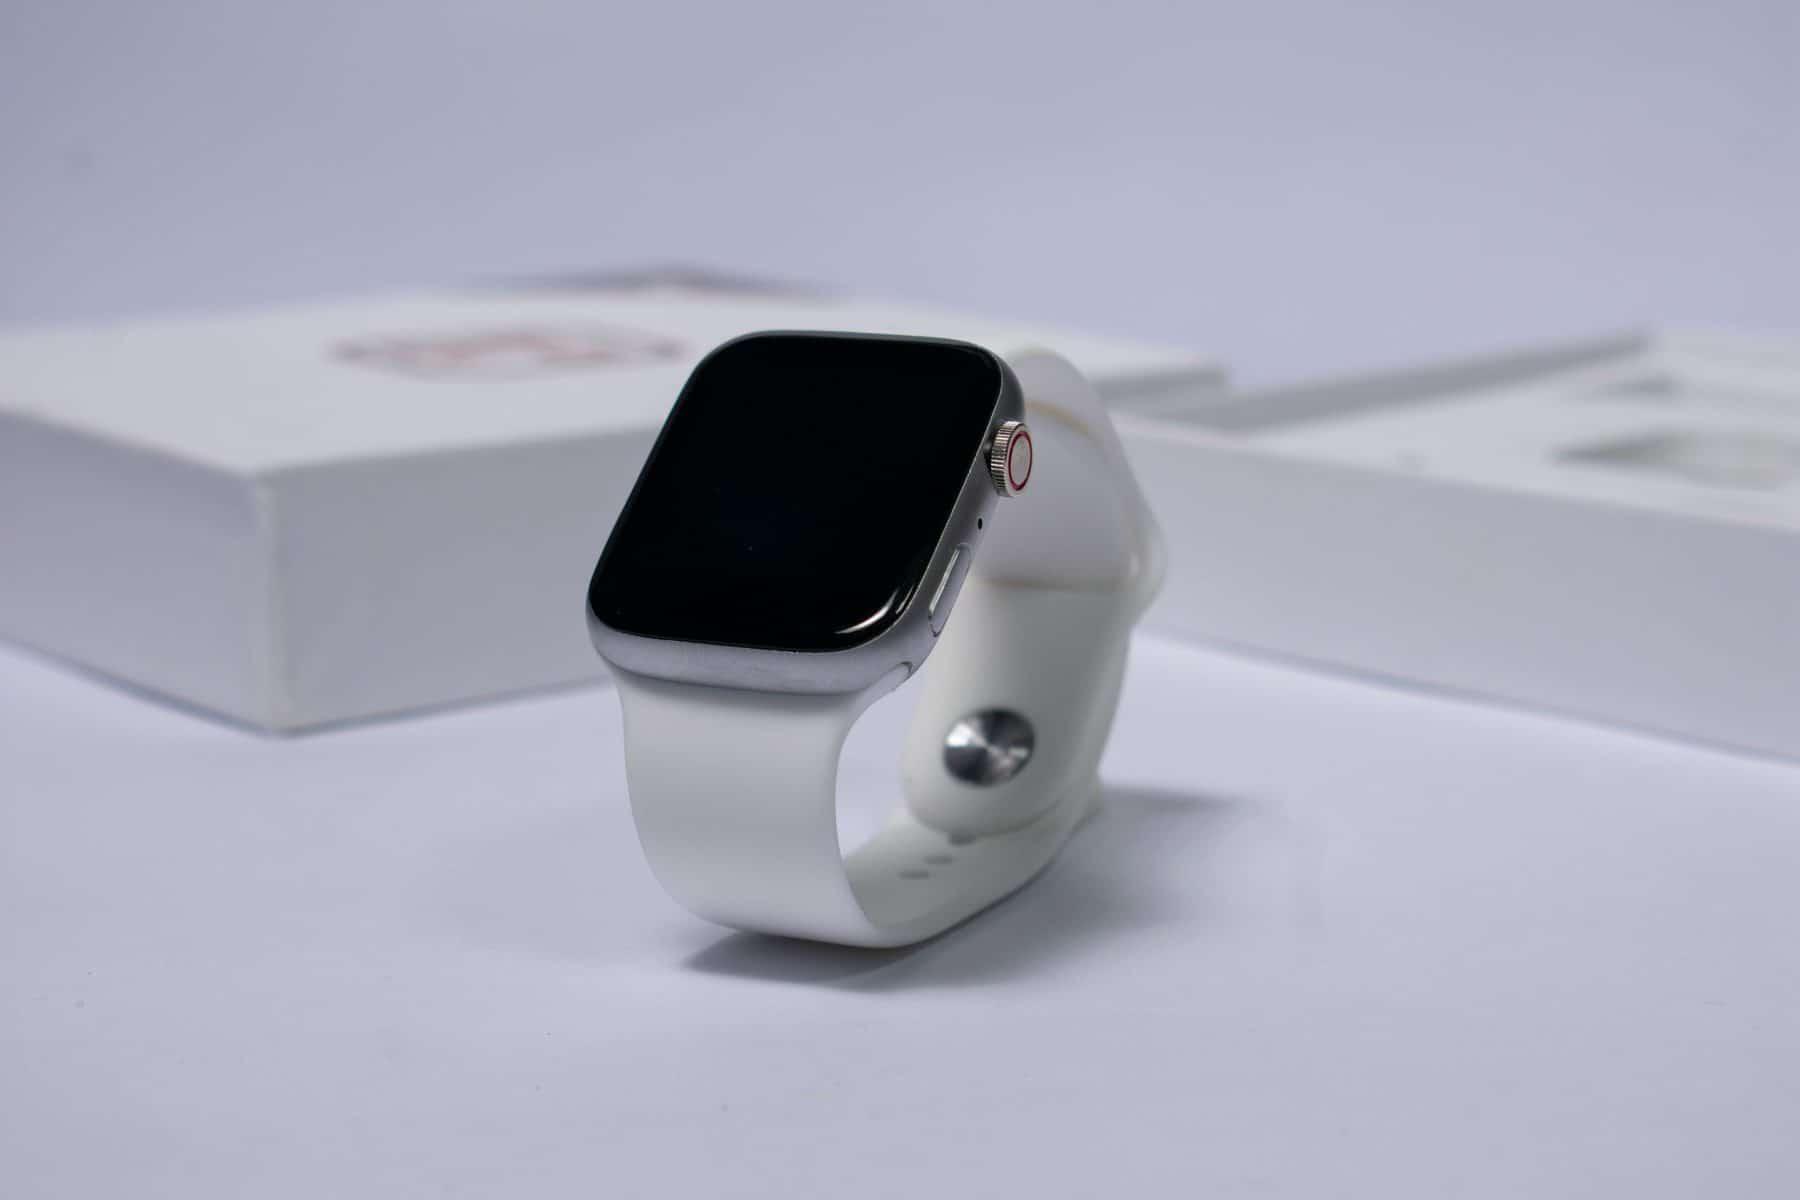 Fake Apple Watch Vs Real